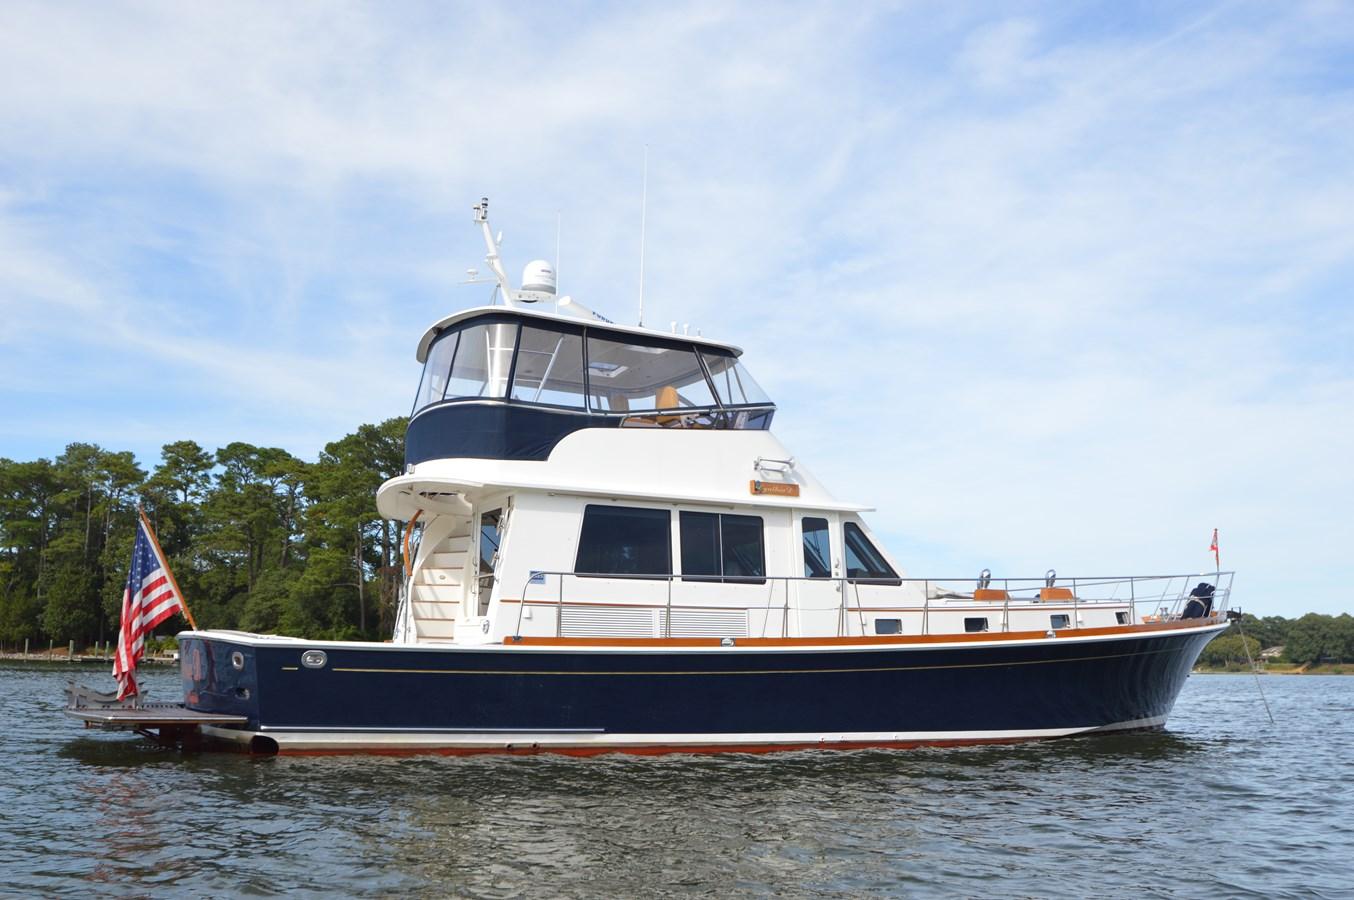 1 2004 GRAND BANKS 58 Eastbay Motor Yacht 2713330